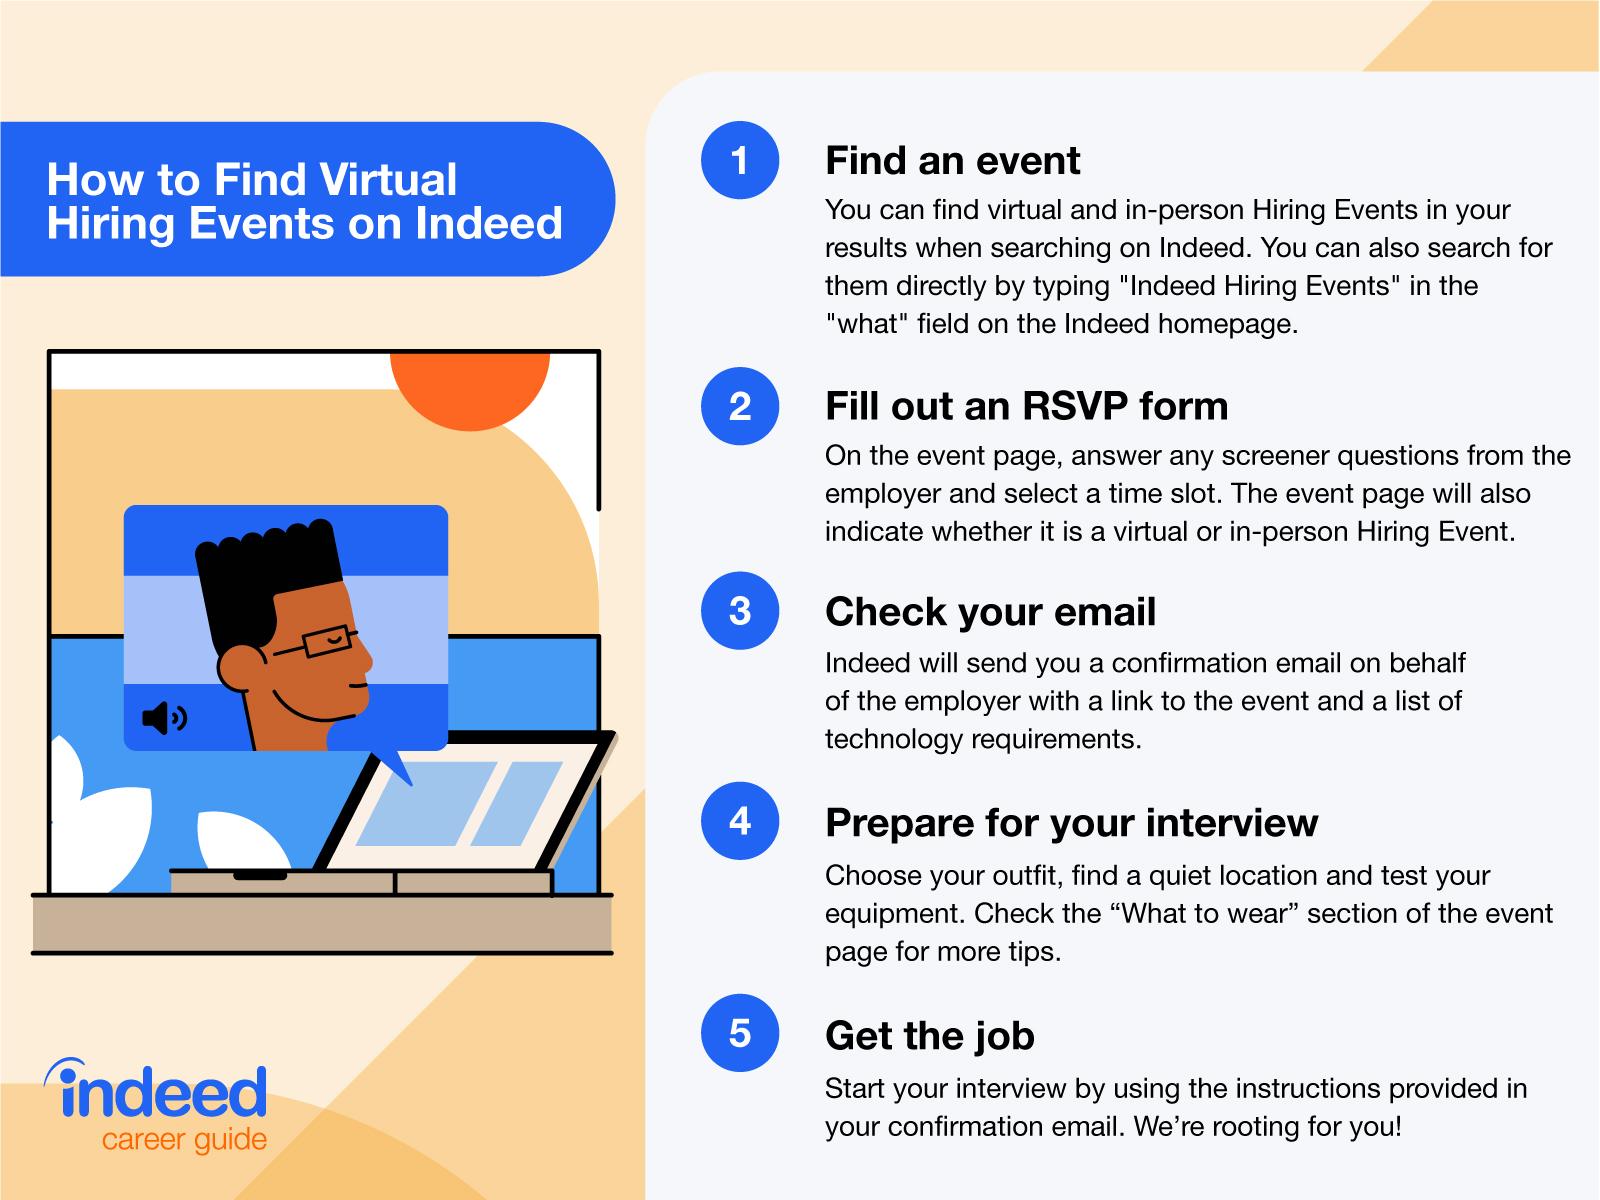 Virtual Hiring Events on Indeed